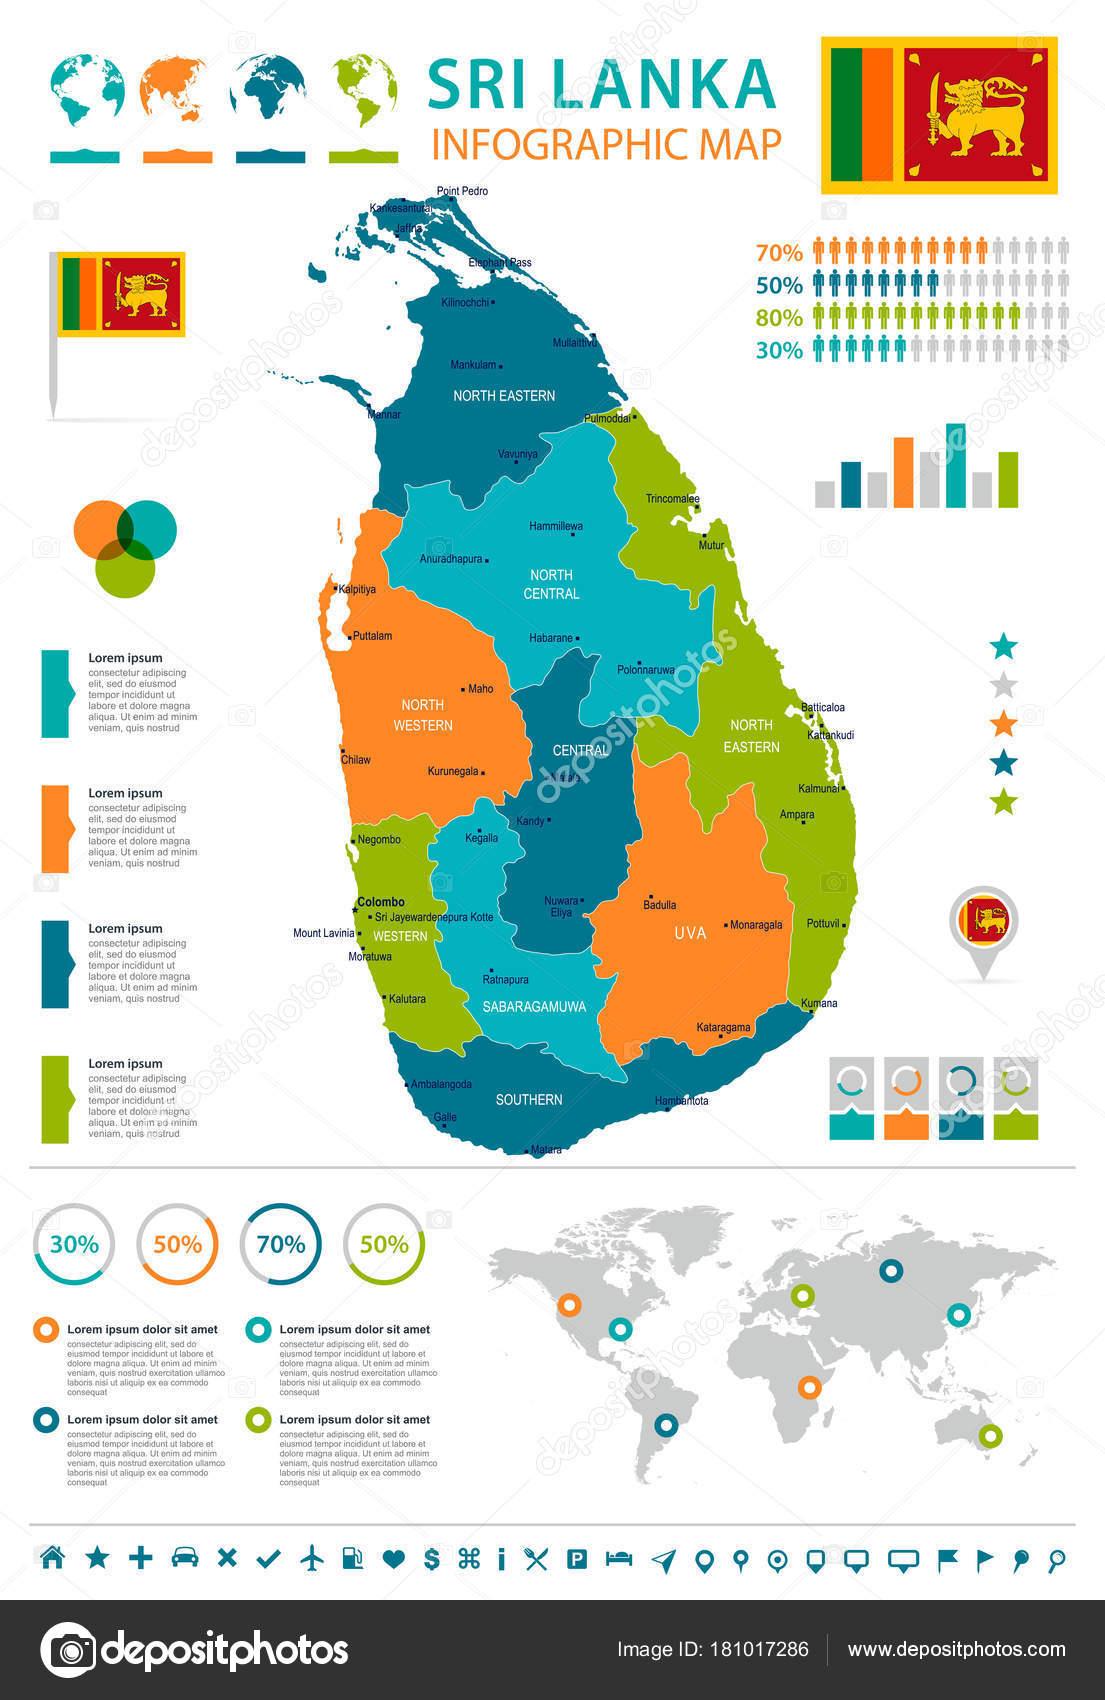 Sri Lanka infographic map and flag Detailed Vector Illustration